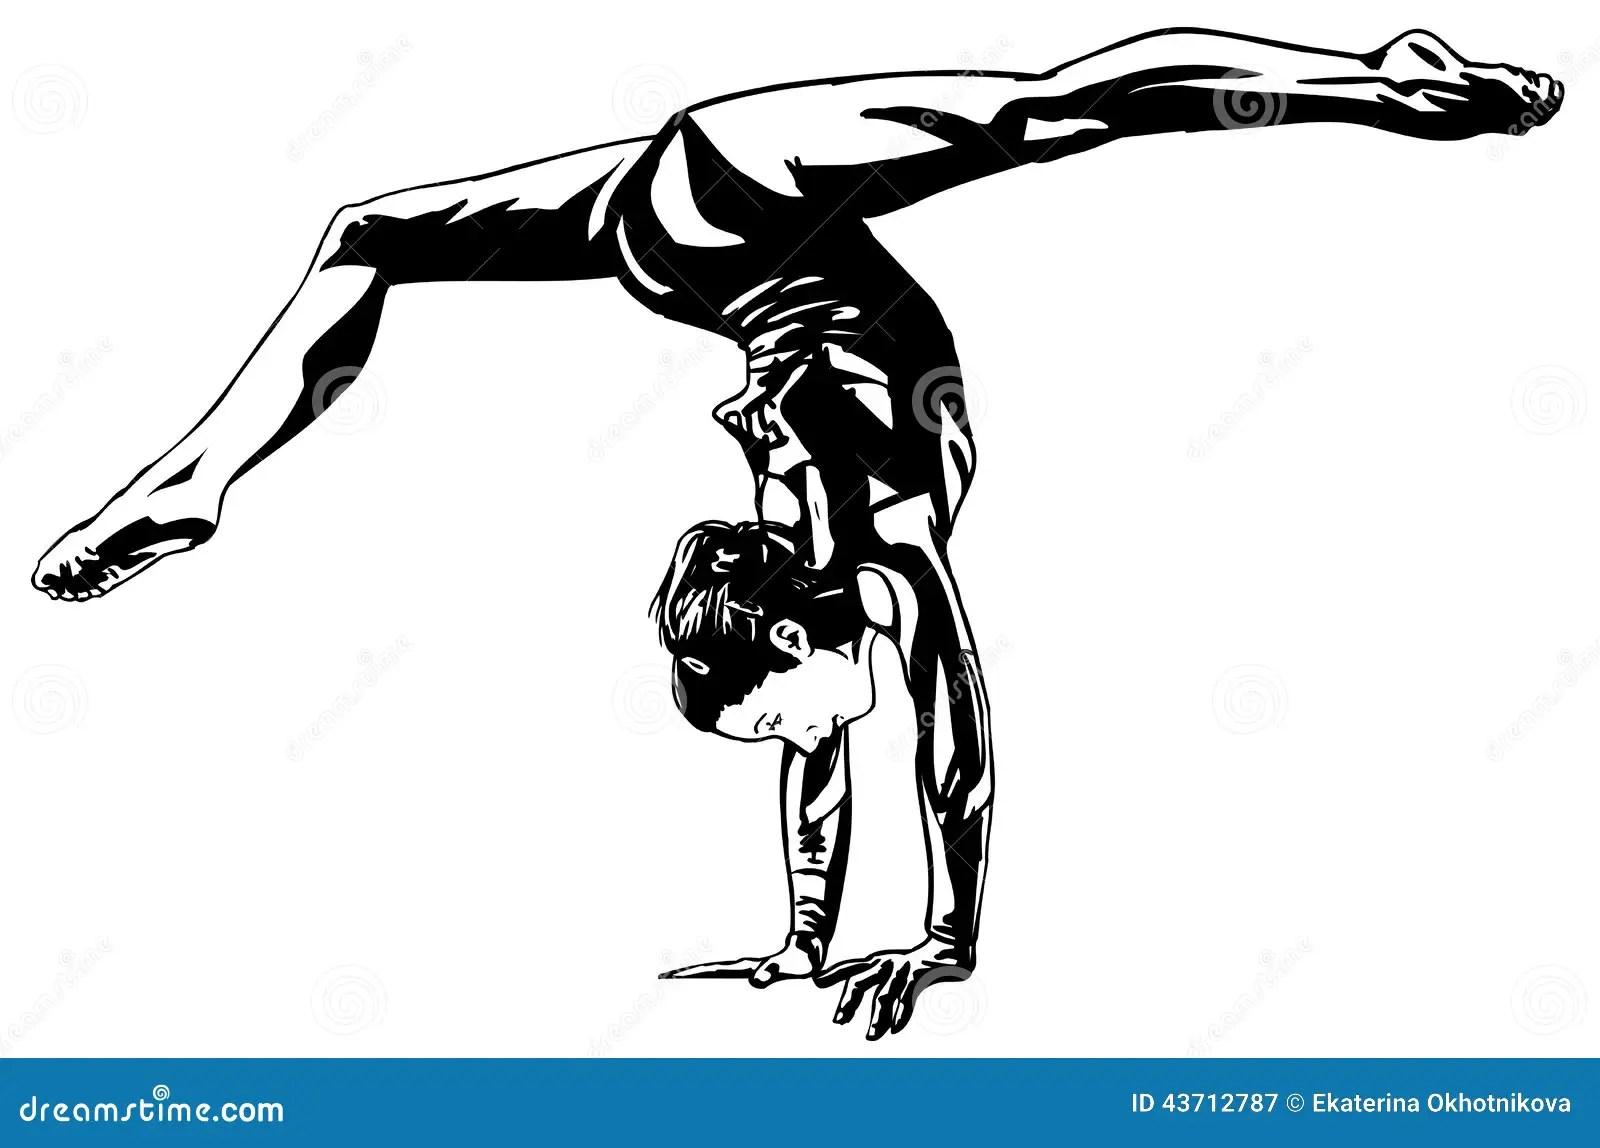 Rhythmic Gymnastics Stock Vector Illustration Of Bending